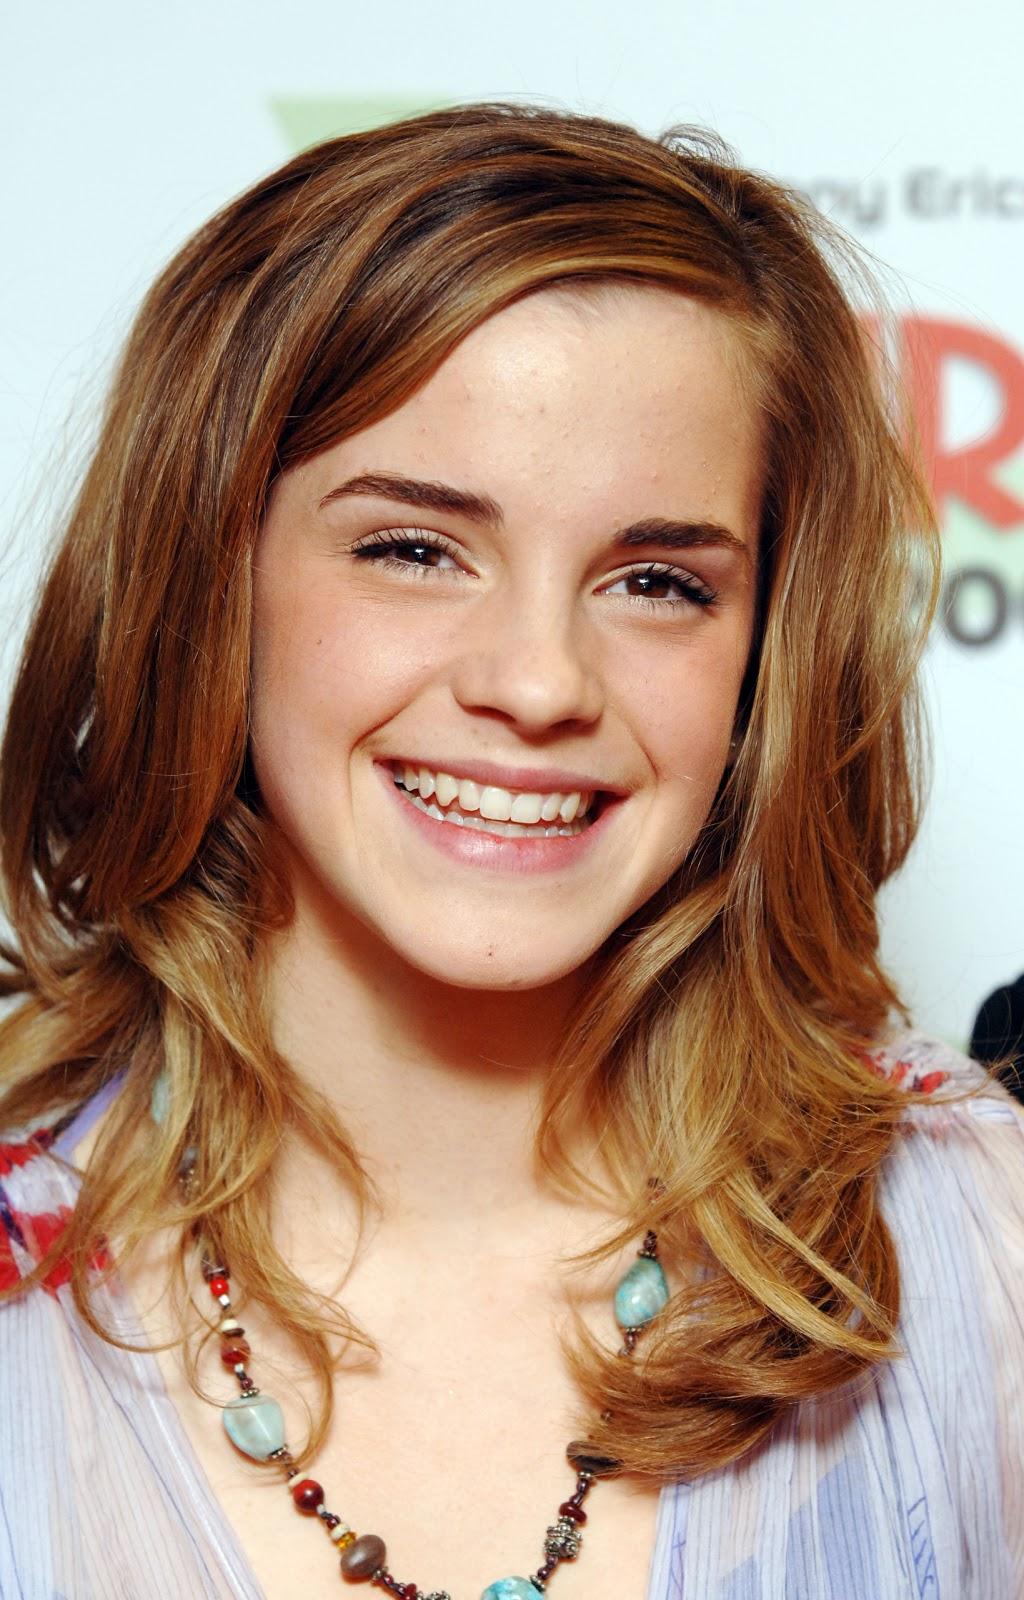 Emma Watson New Hair Cut Looks Angled Bob Hairstyle